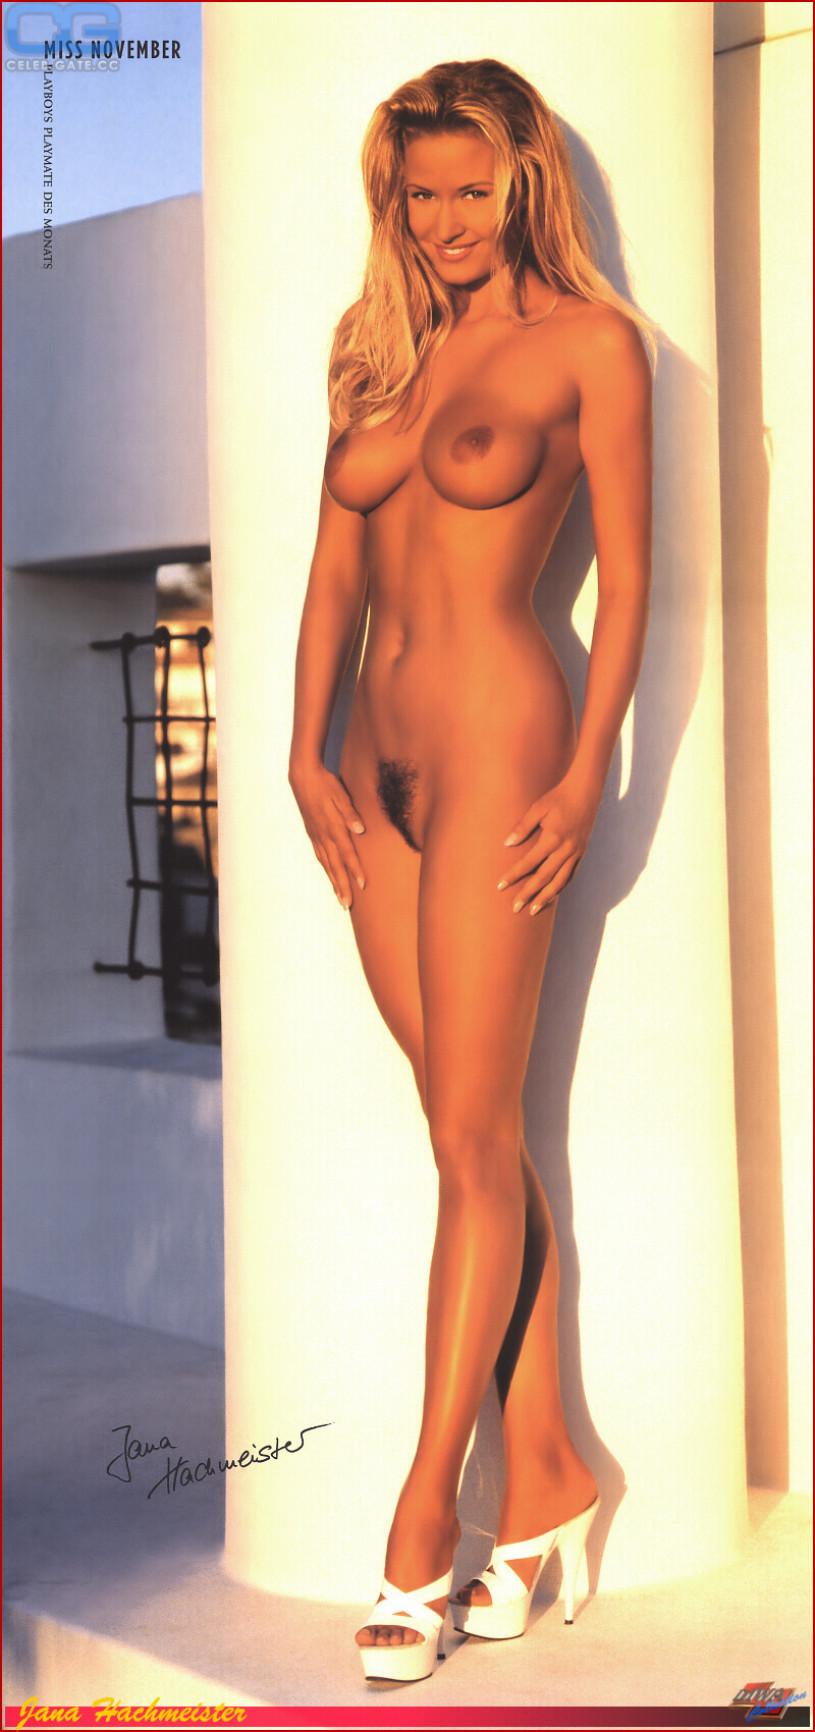 Key west fantasy fest nude